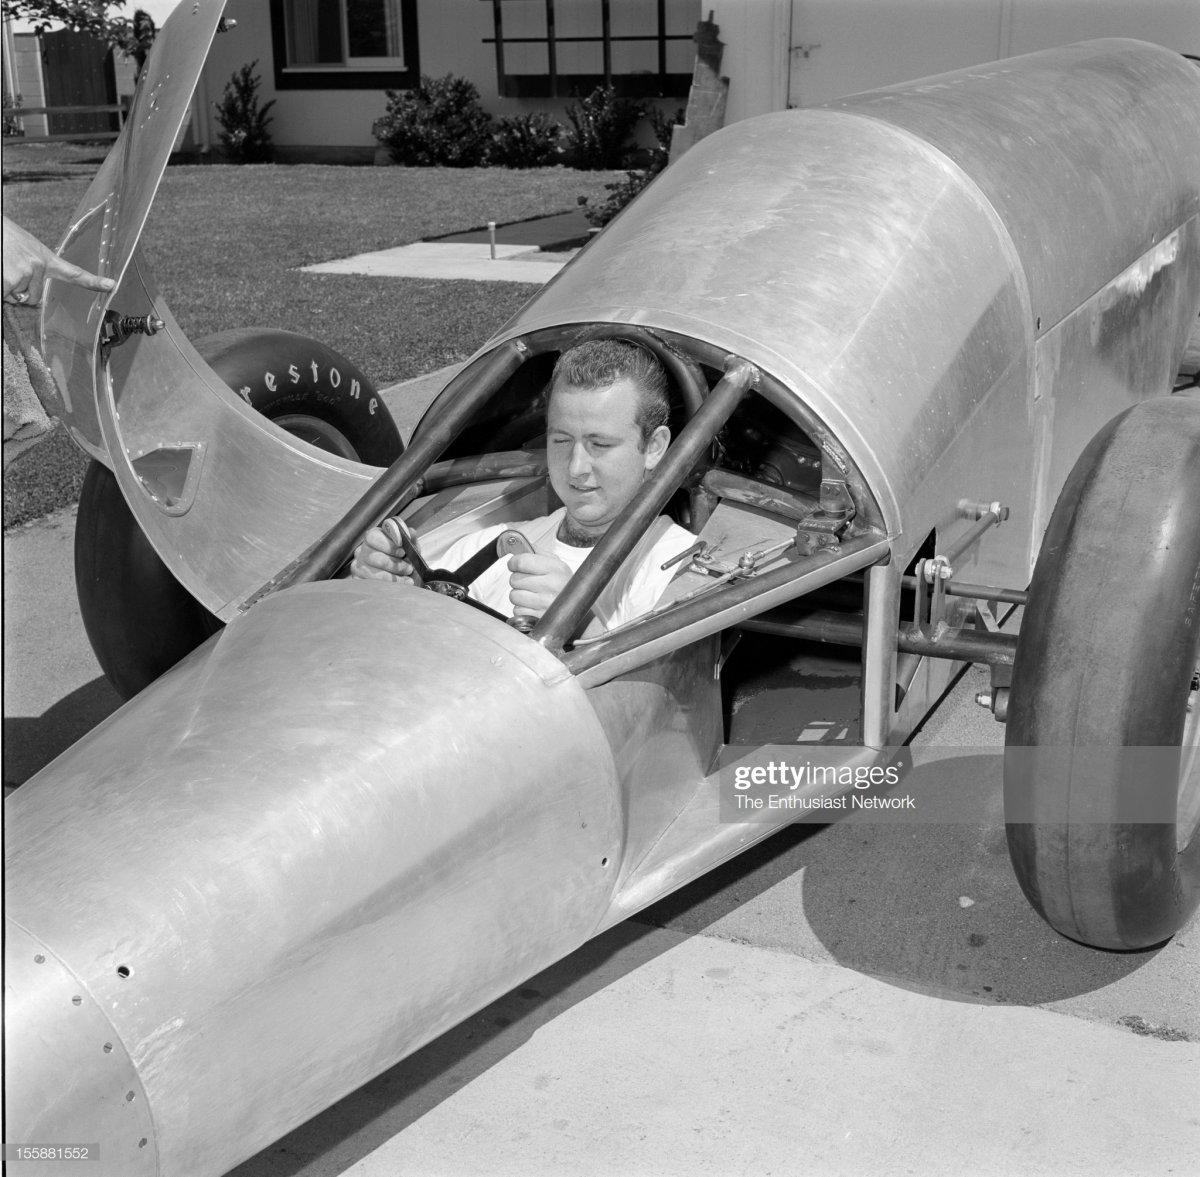 74 Bill Fredrick Valkyrie Jet Car1.jpg